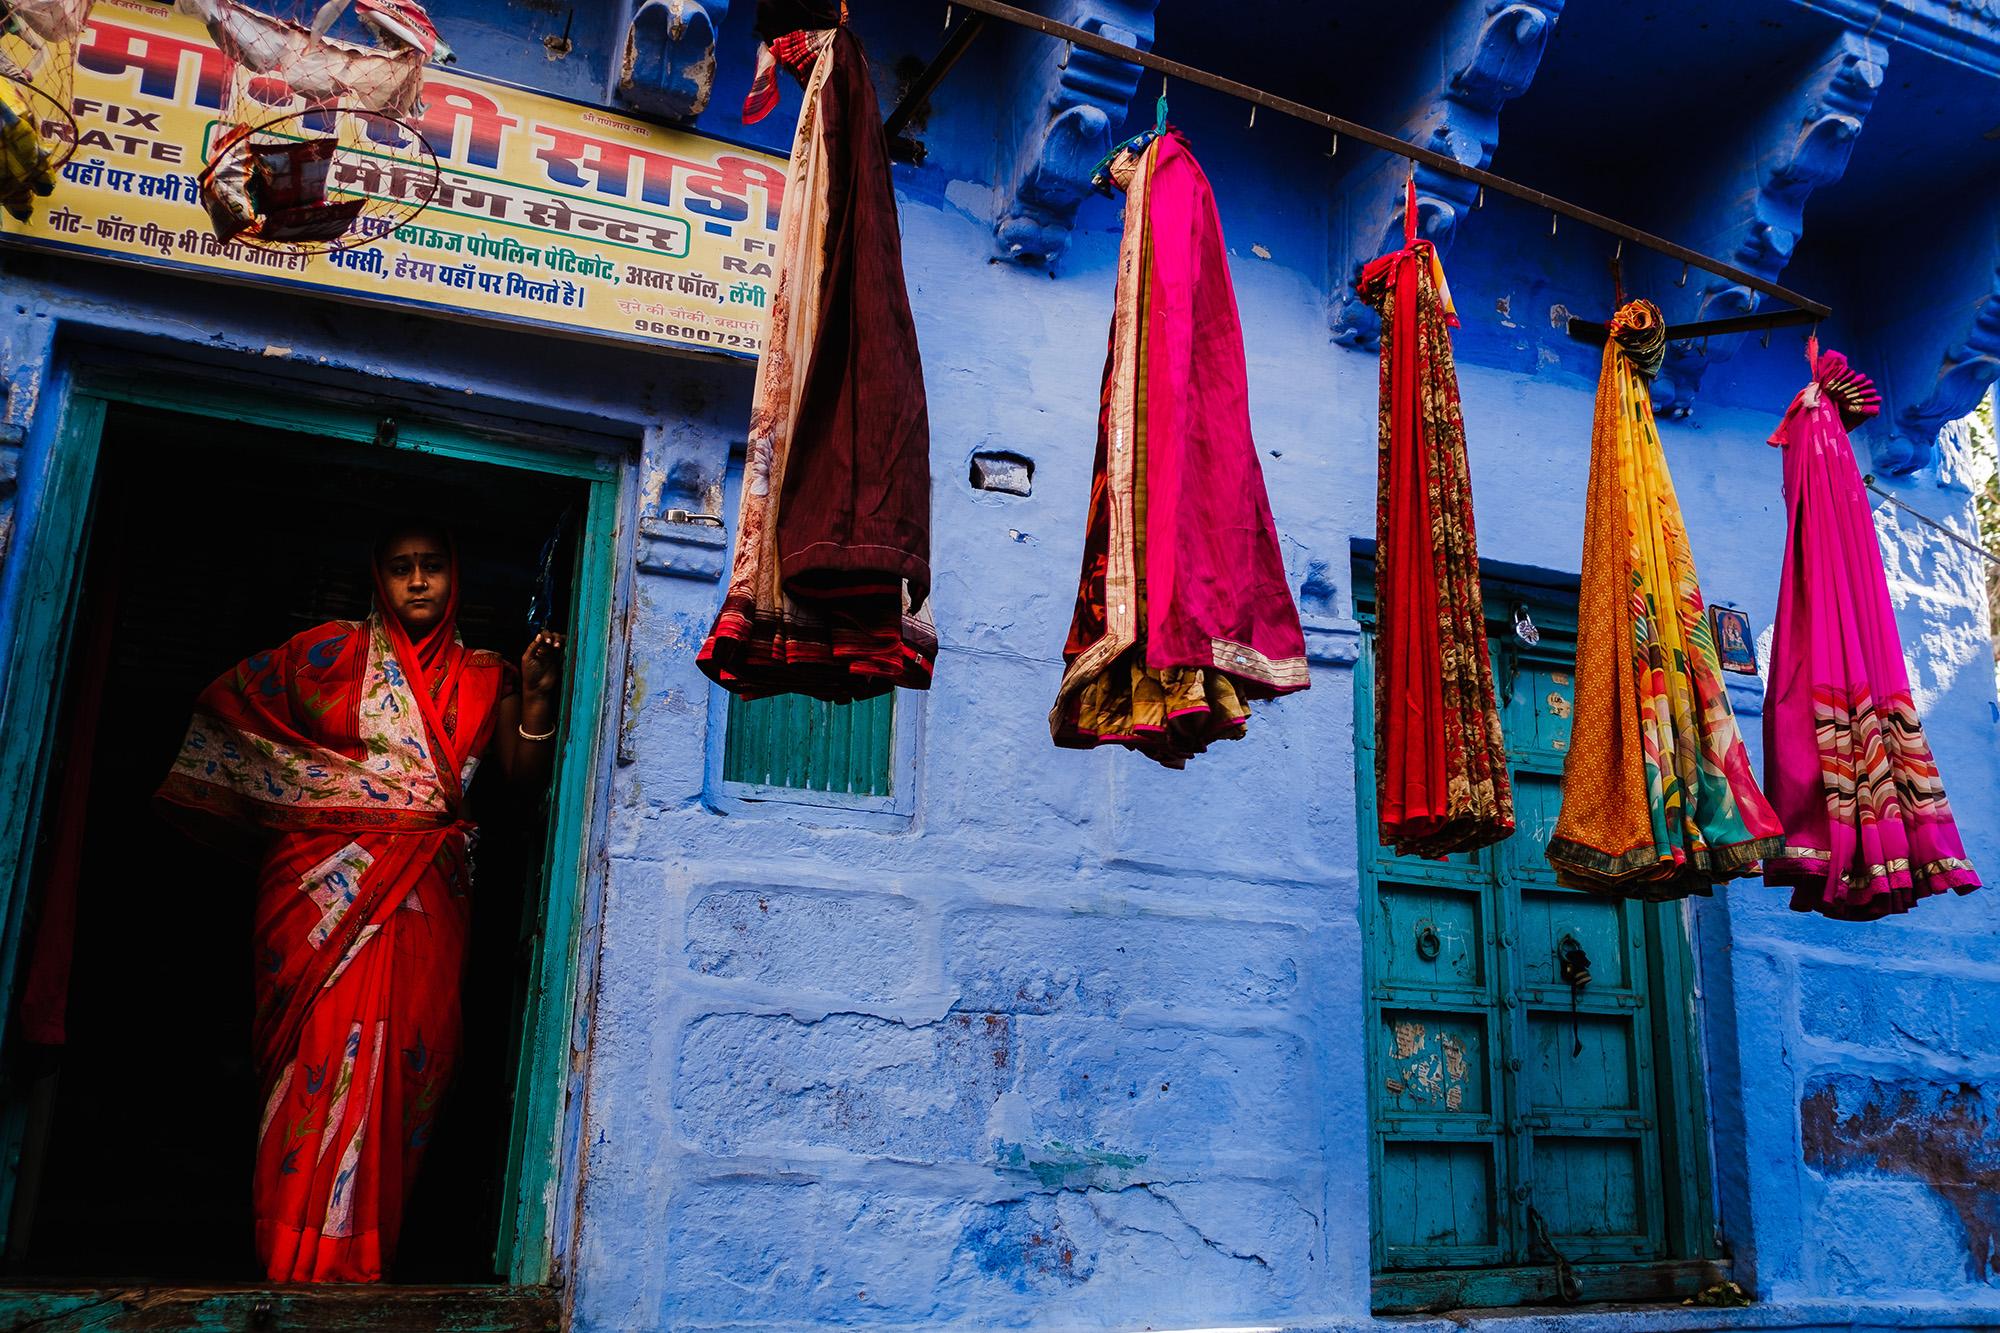 AnjaPoehlmann_India-Jodhpur_053.jpg